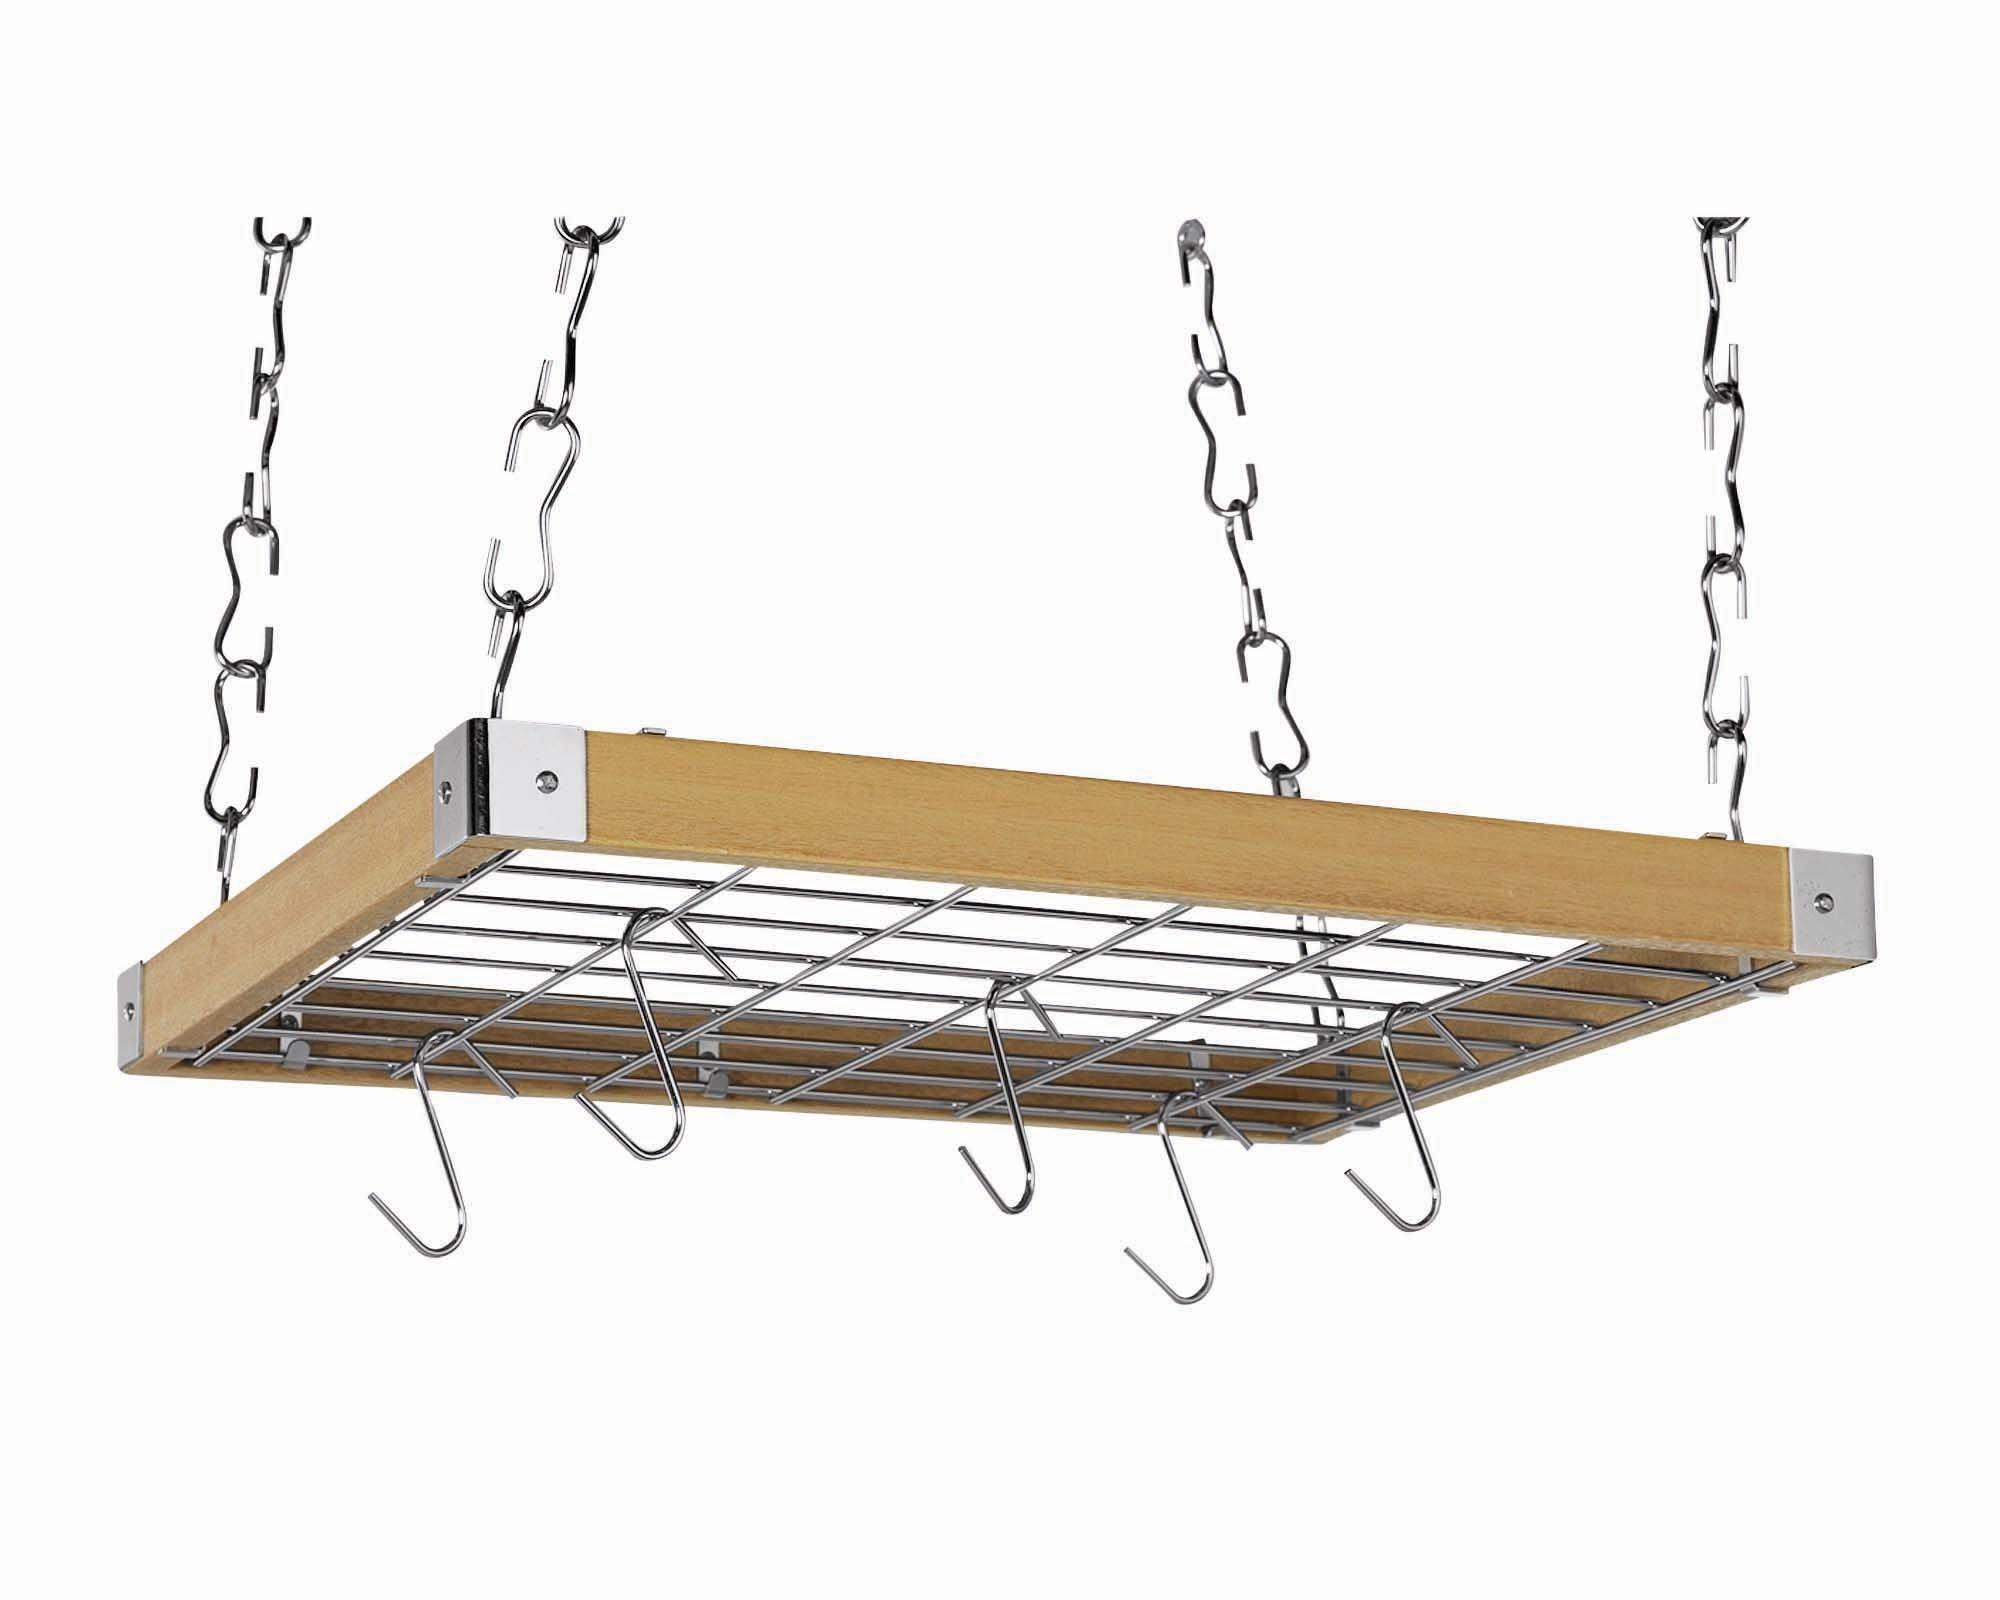 Concept Housewares PR-40293 Hardwood Square Hanging Pot Rack, Natural